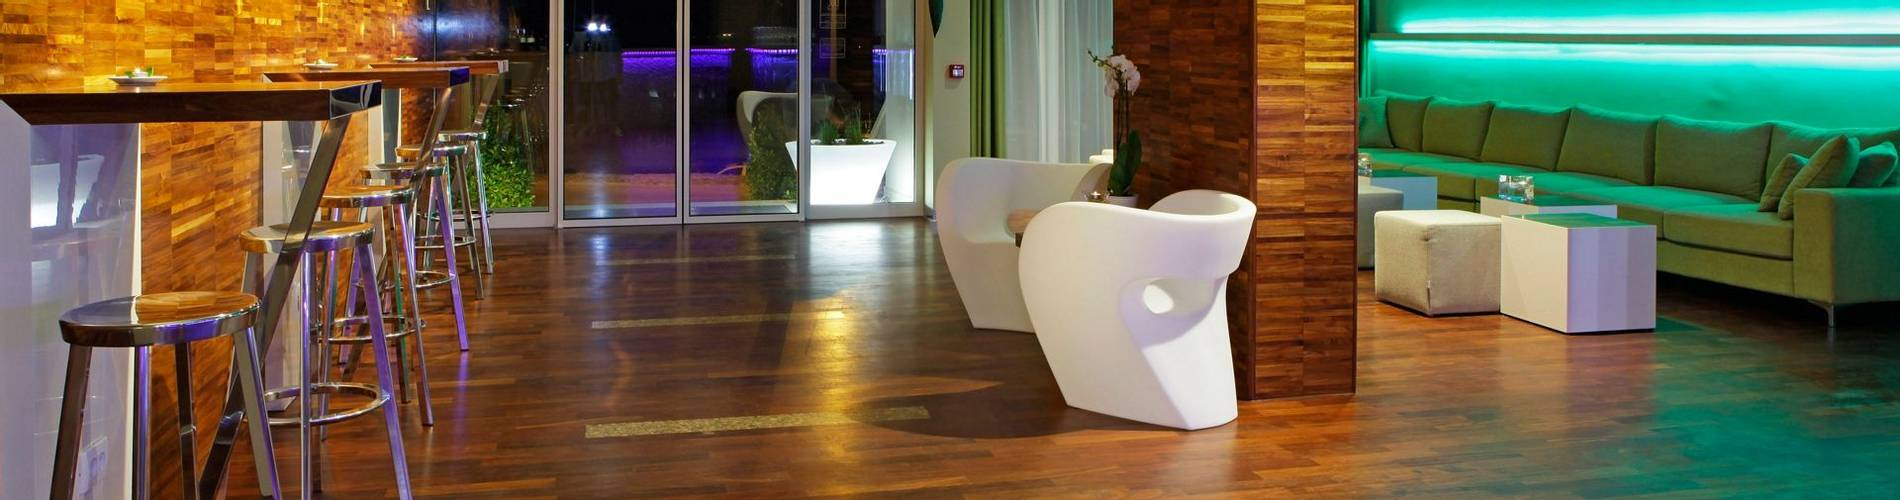 Hotel Bol, Central Dalmatia, Croatia (7).jpg